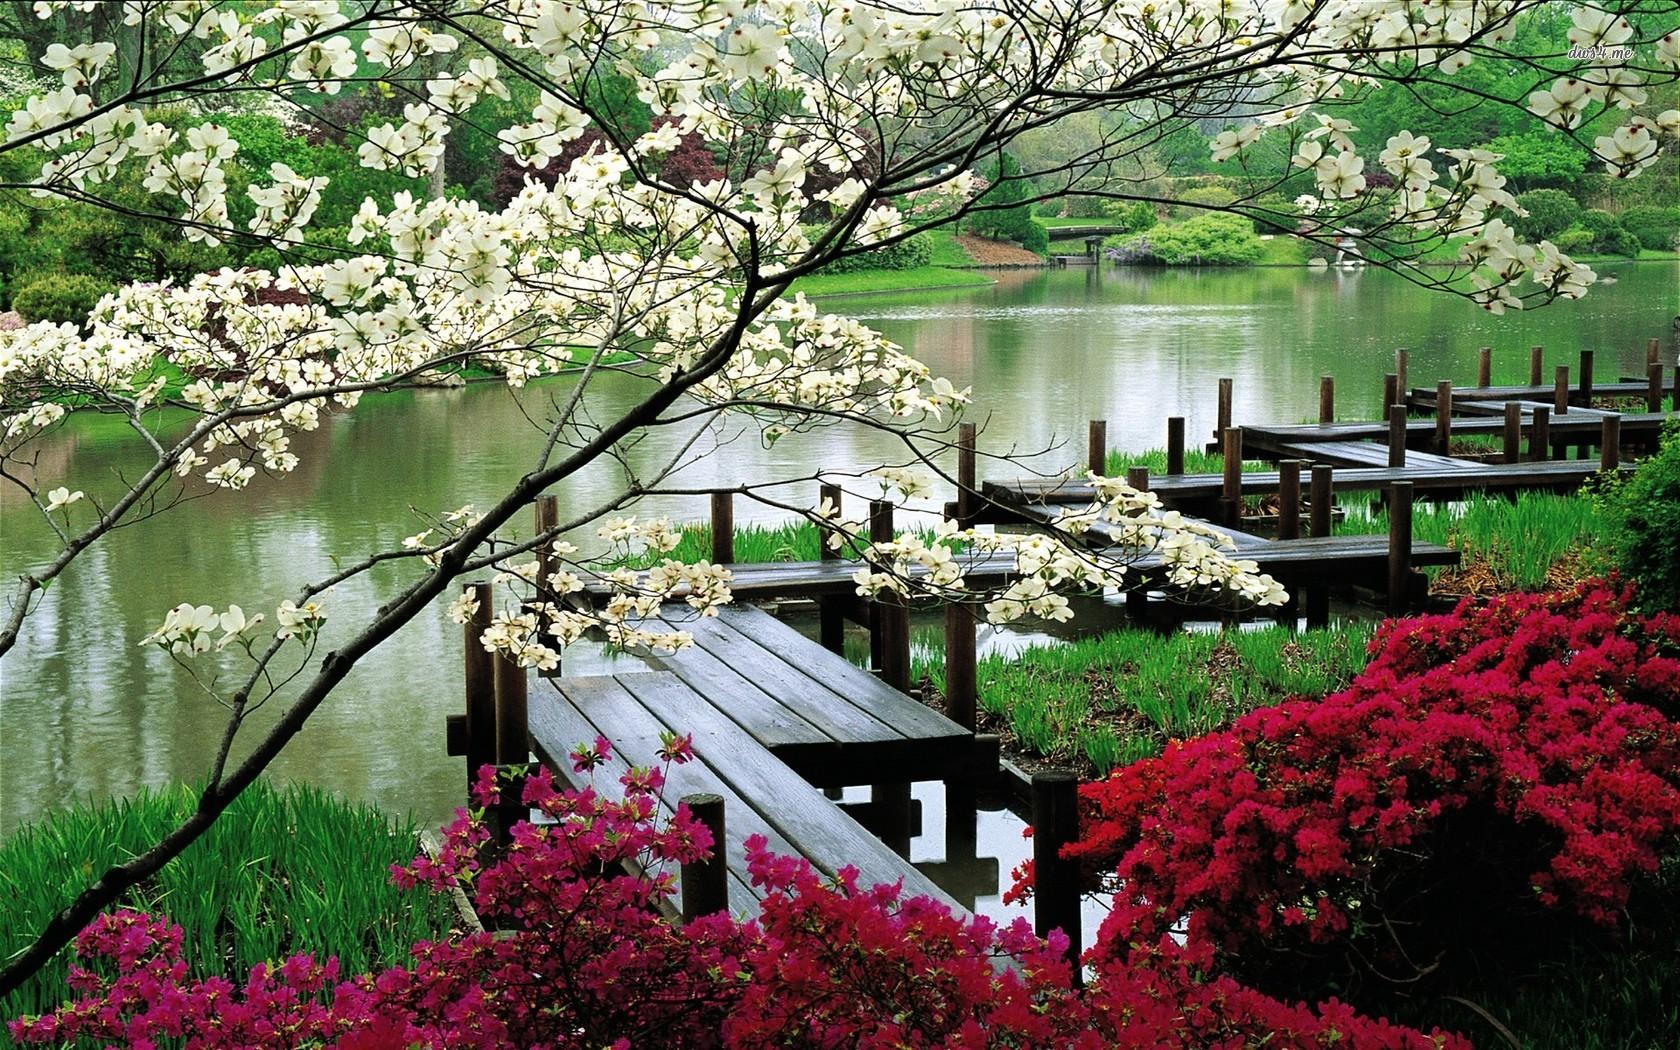 Japanese Garden Plants Pictures 20270 Wallpaper Wallpaper hd 1680x1050